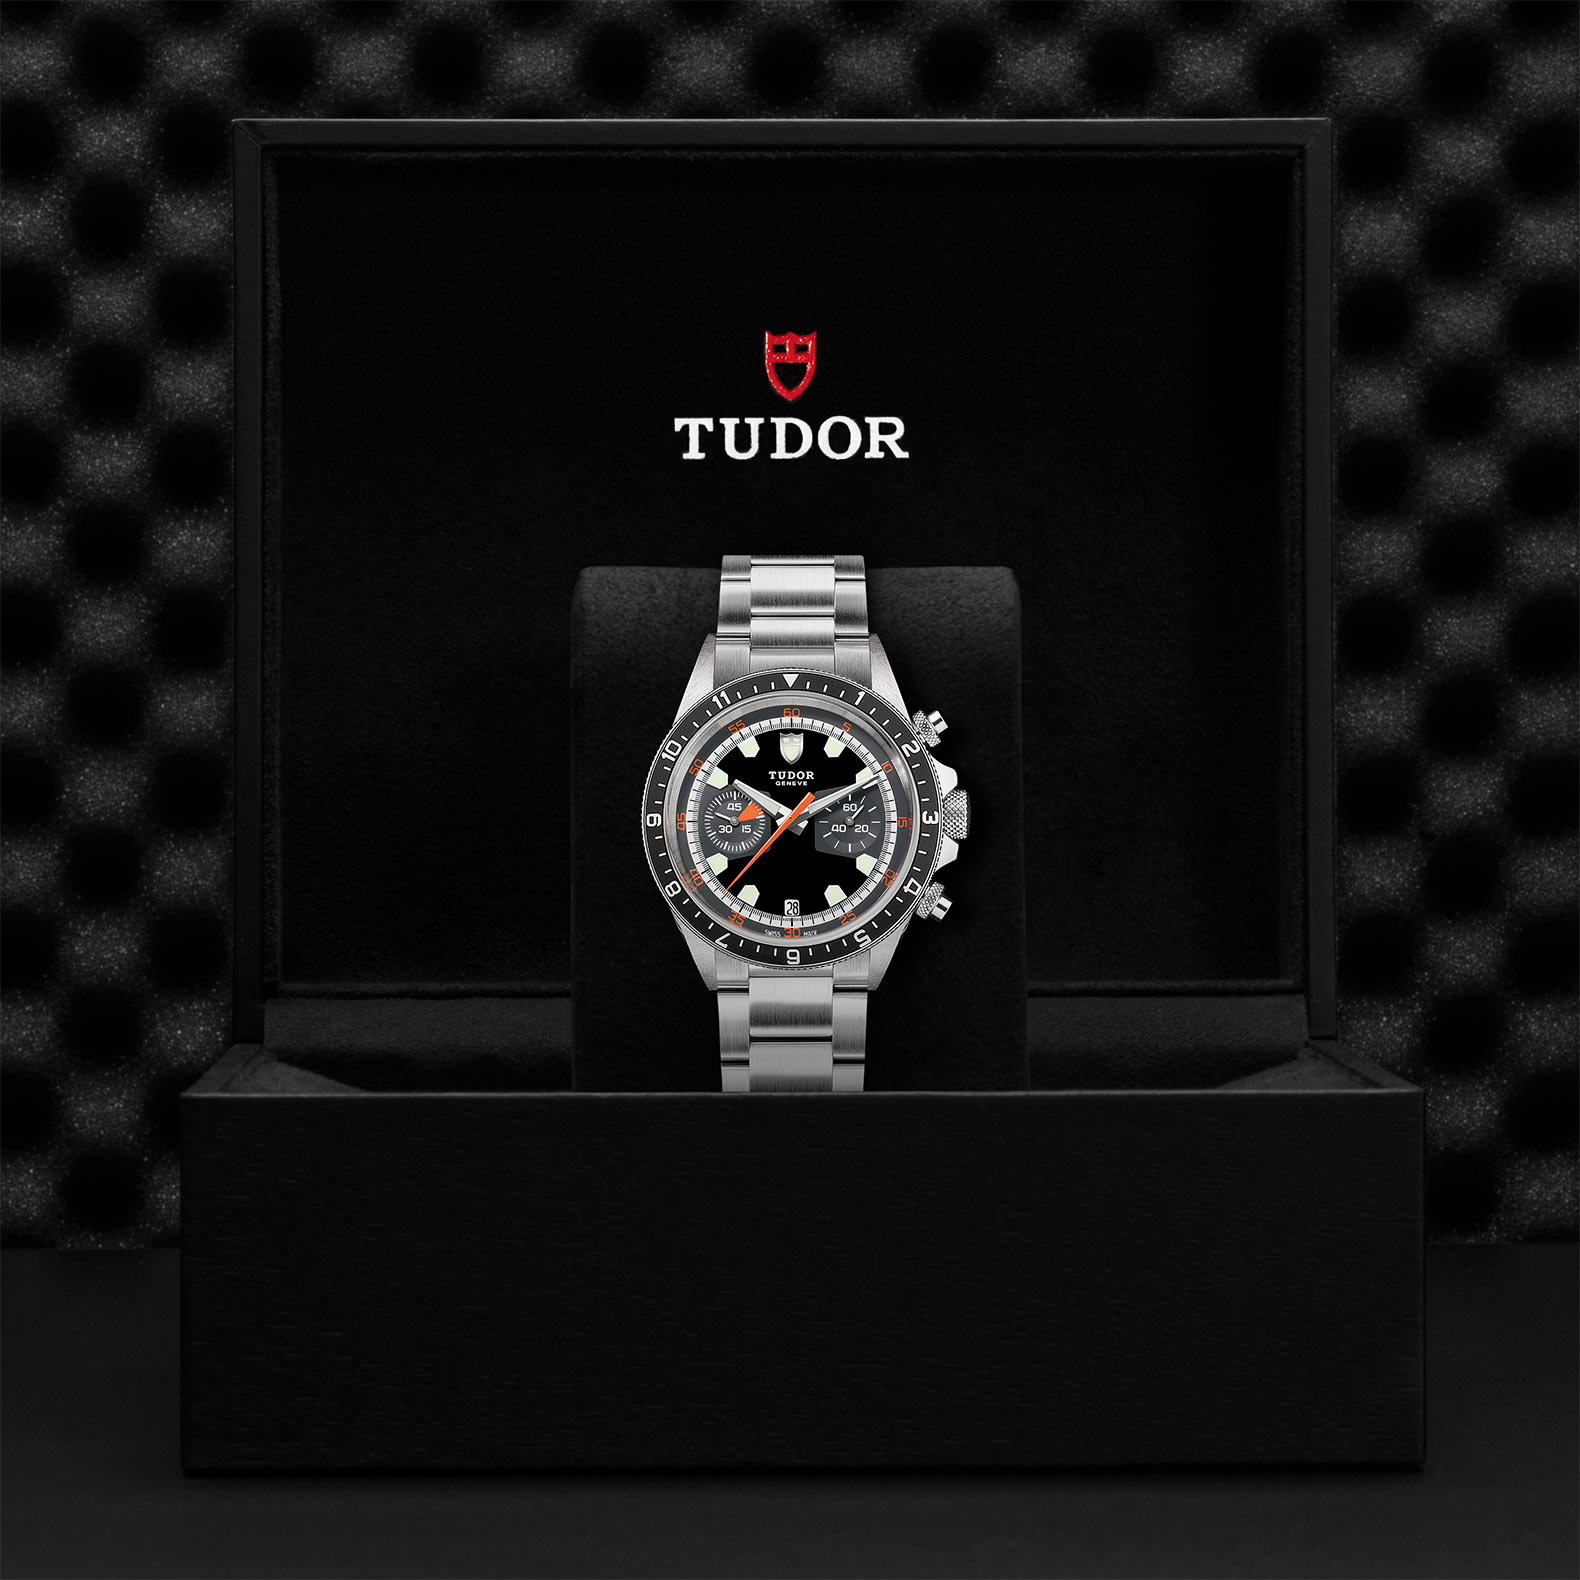 TUDOR Heritage Chrono M70330N 0005 Presentation